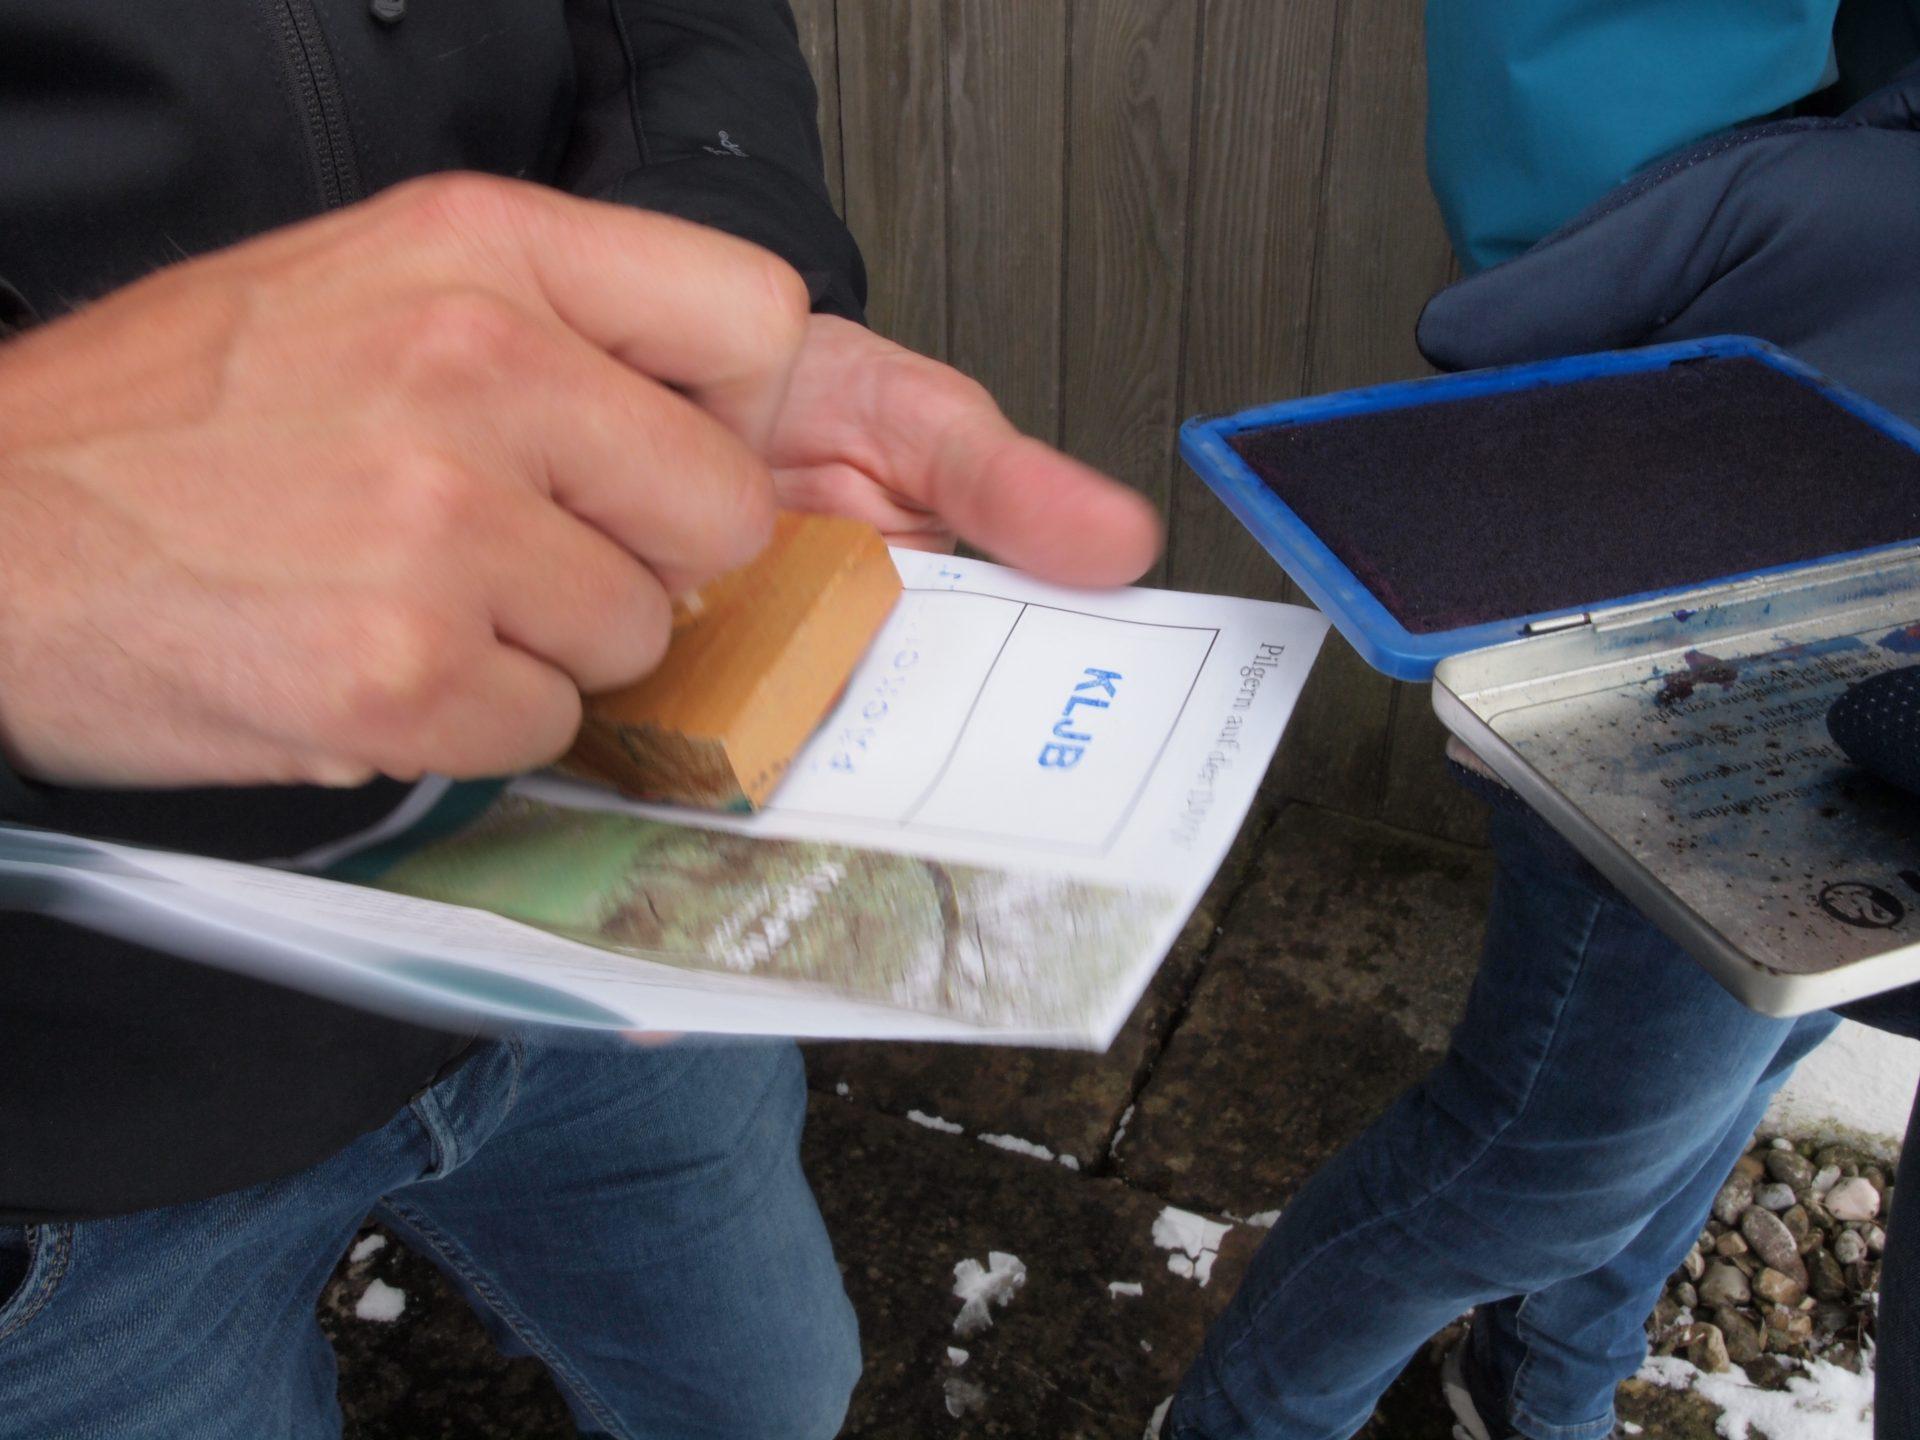 Erste Stempel sammeln sich im Pilgerausweis